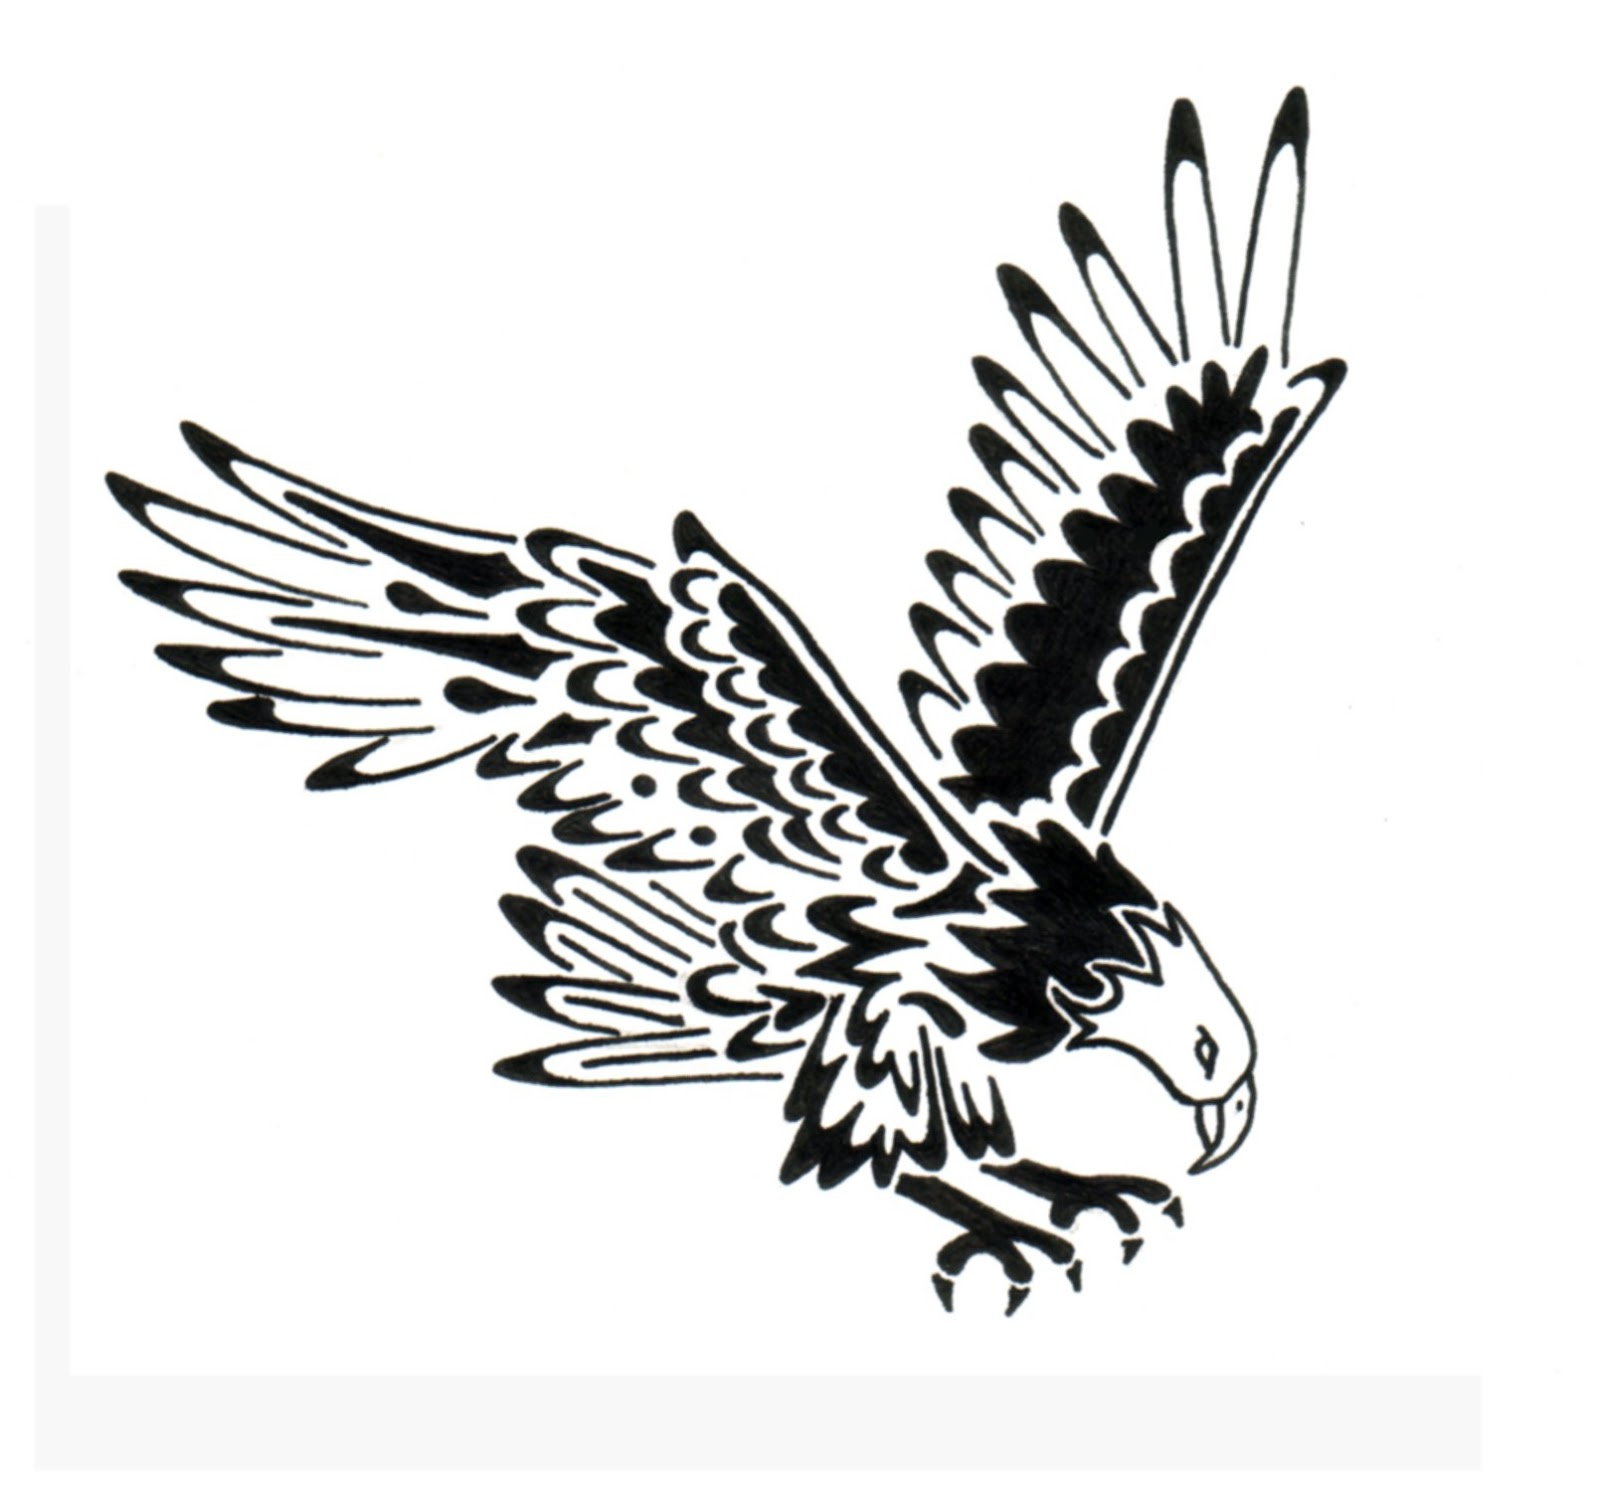 Bald Eagle Flying Drawing